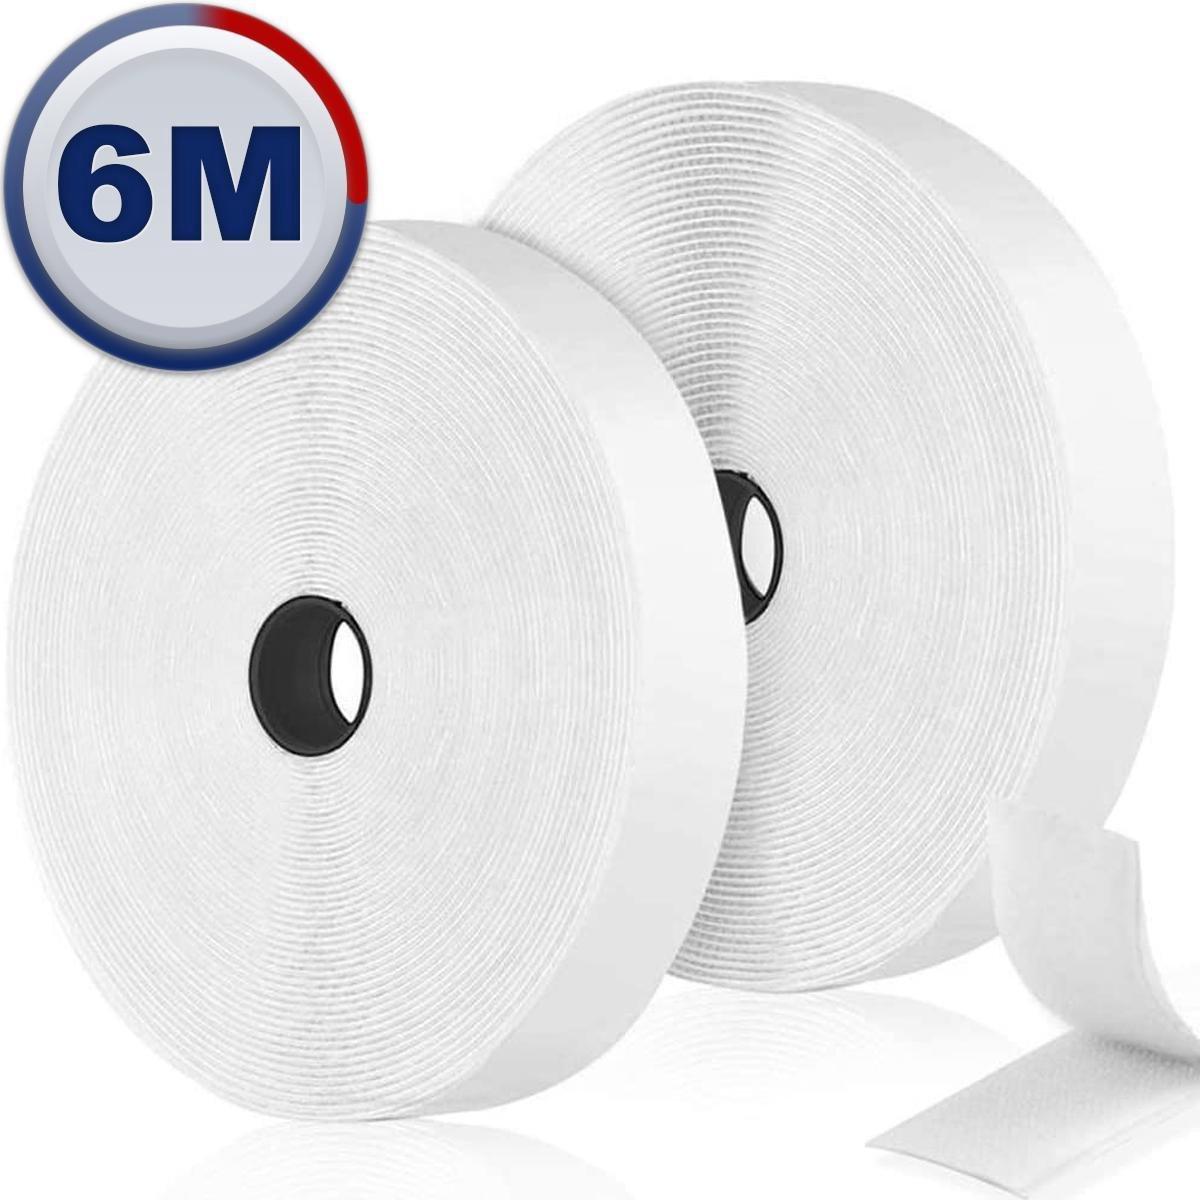 AWEMOZ  Klittenband Zelfklevend - Witte Velcro - Klussen - 2 x 6 m Velcro Tape - 2 cm breed